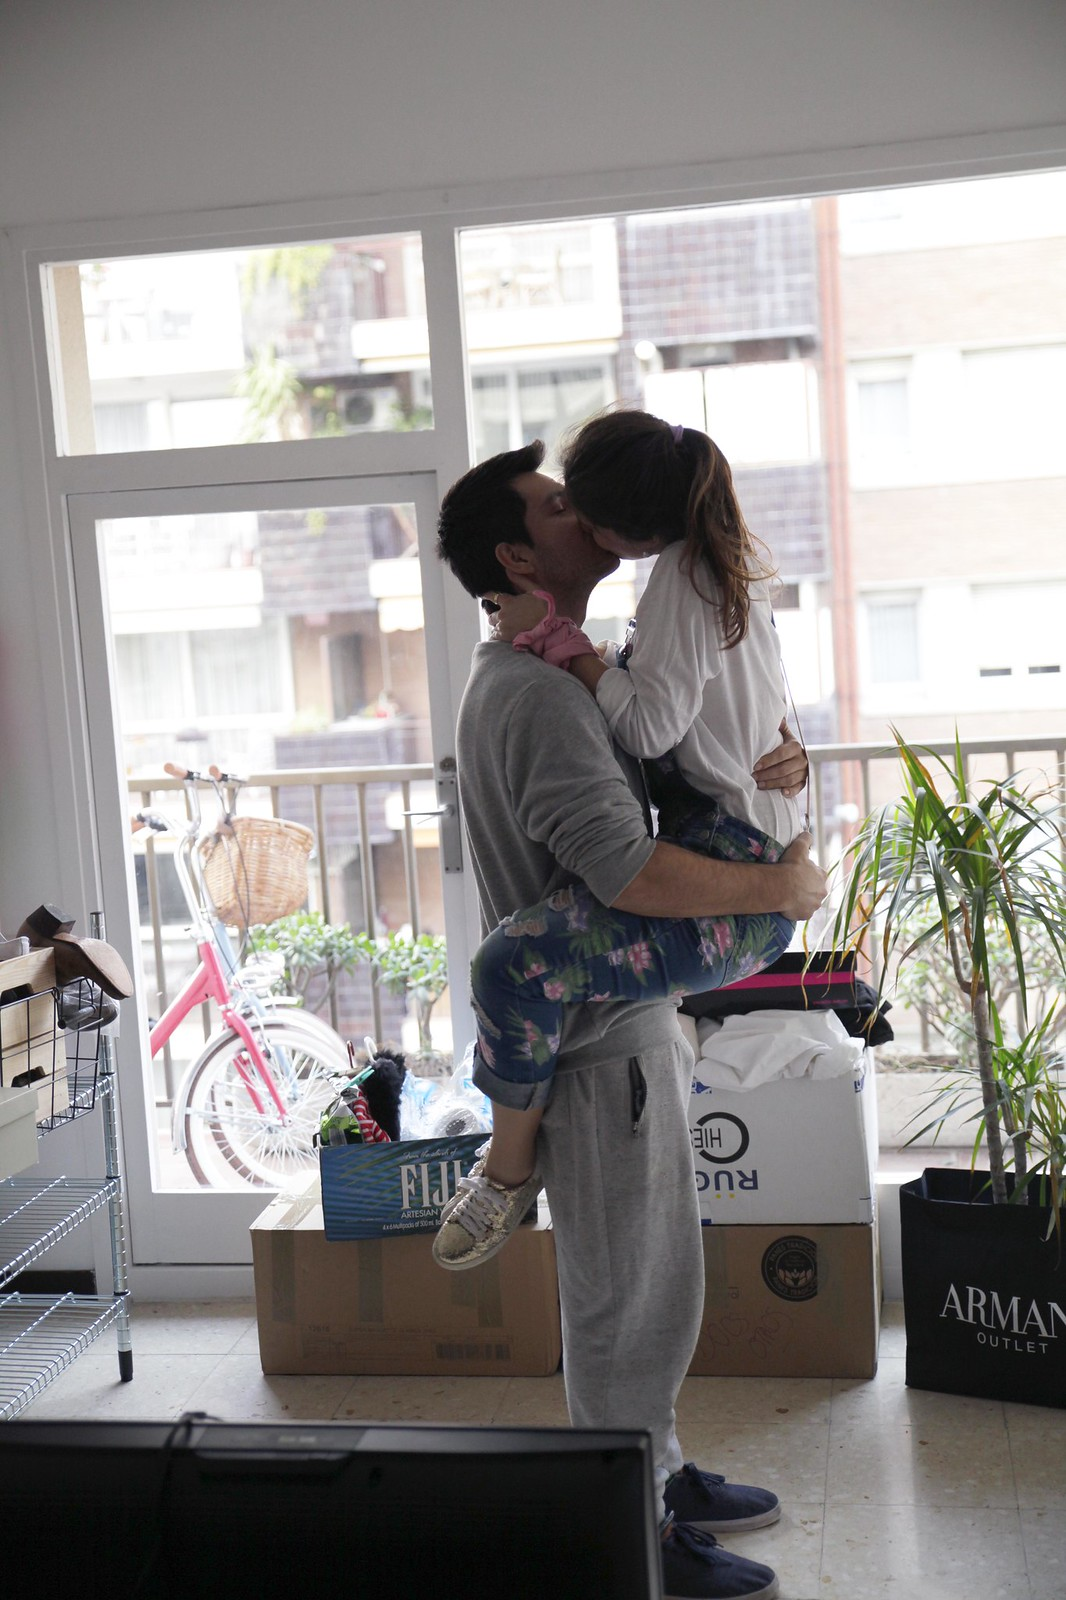 00_Aloha_Home_blogger_deco_barcelona_theguestgirl_and_mrk_kilian_sevilla_laura_santolaria